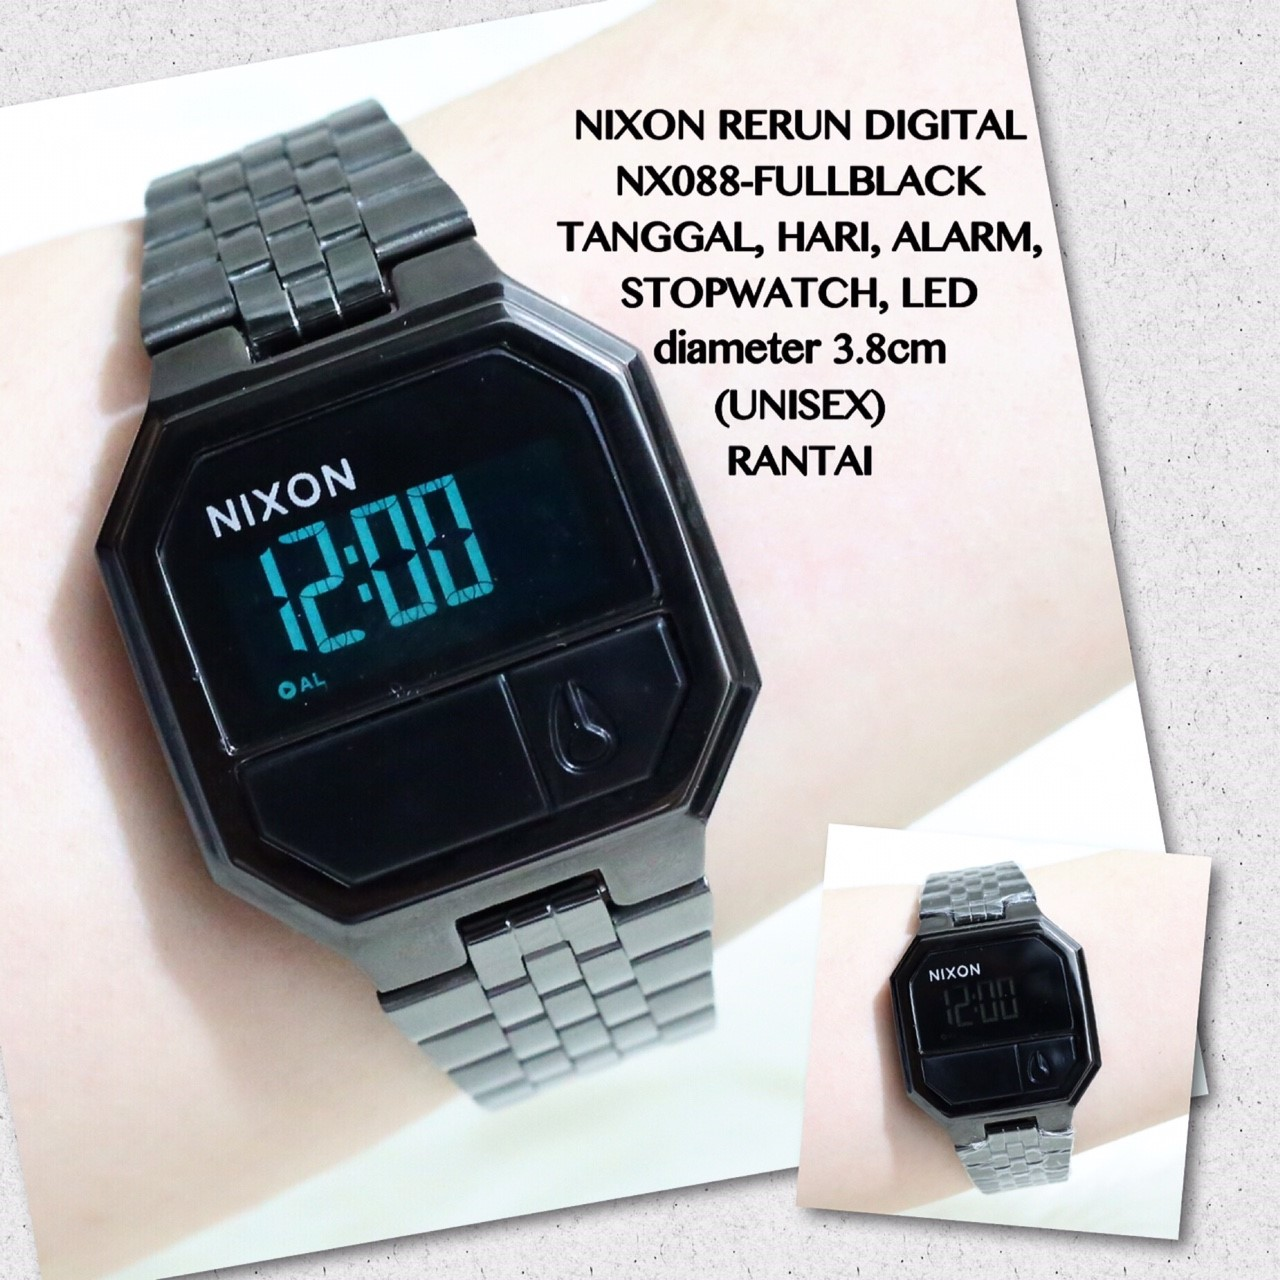 Jam tangan NIXON RERUN digital ukuran unisex grosir termurah import